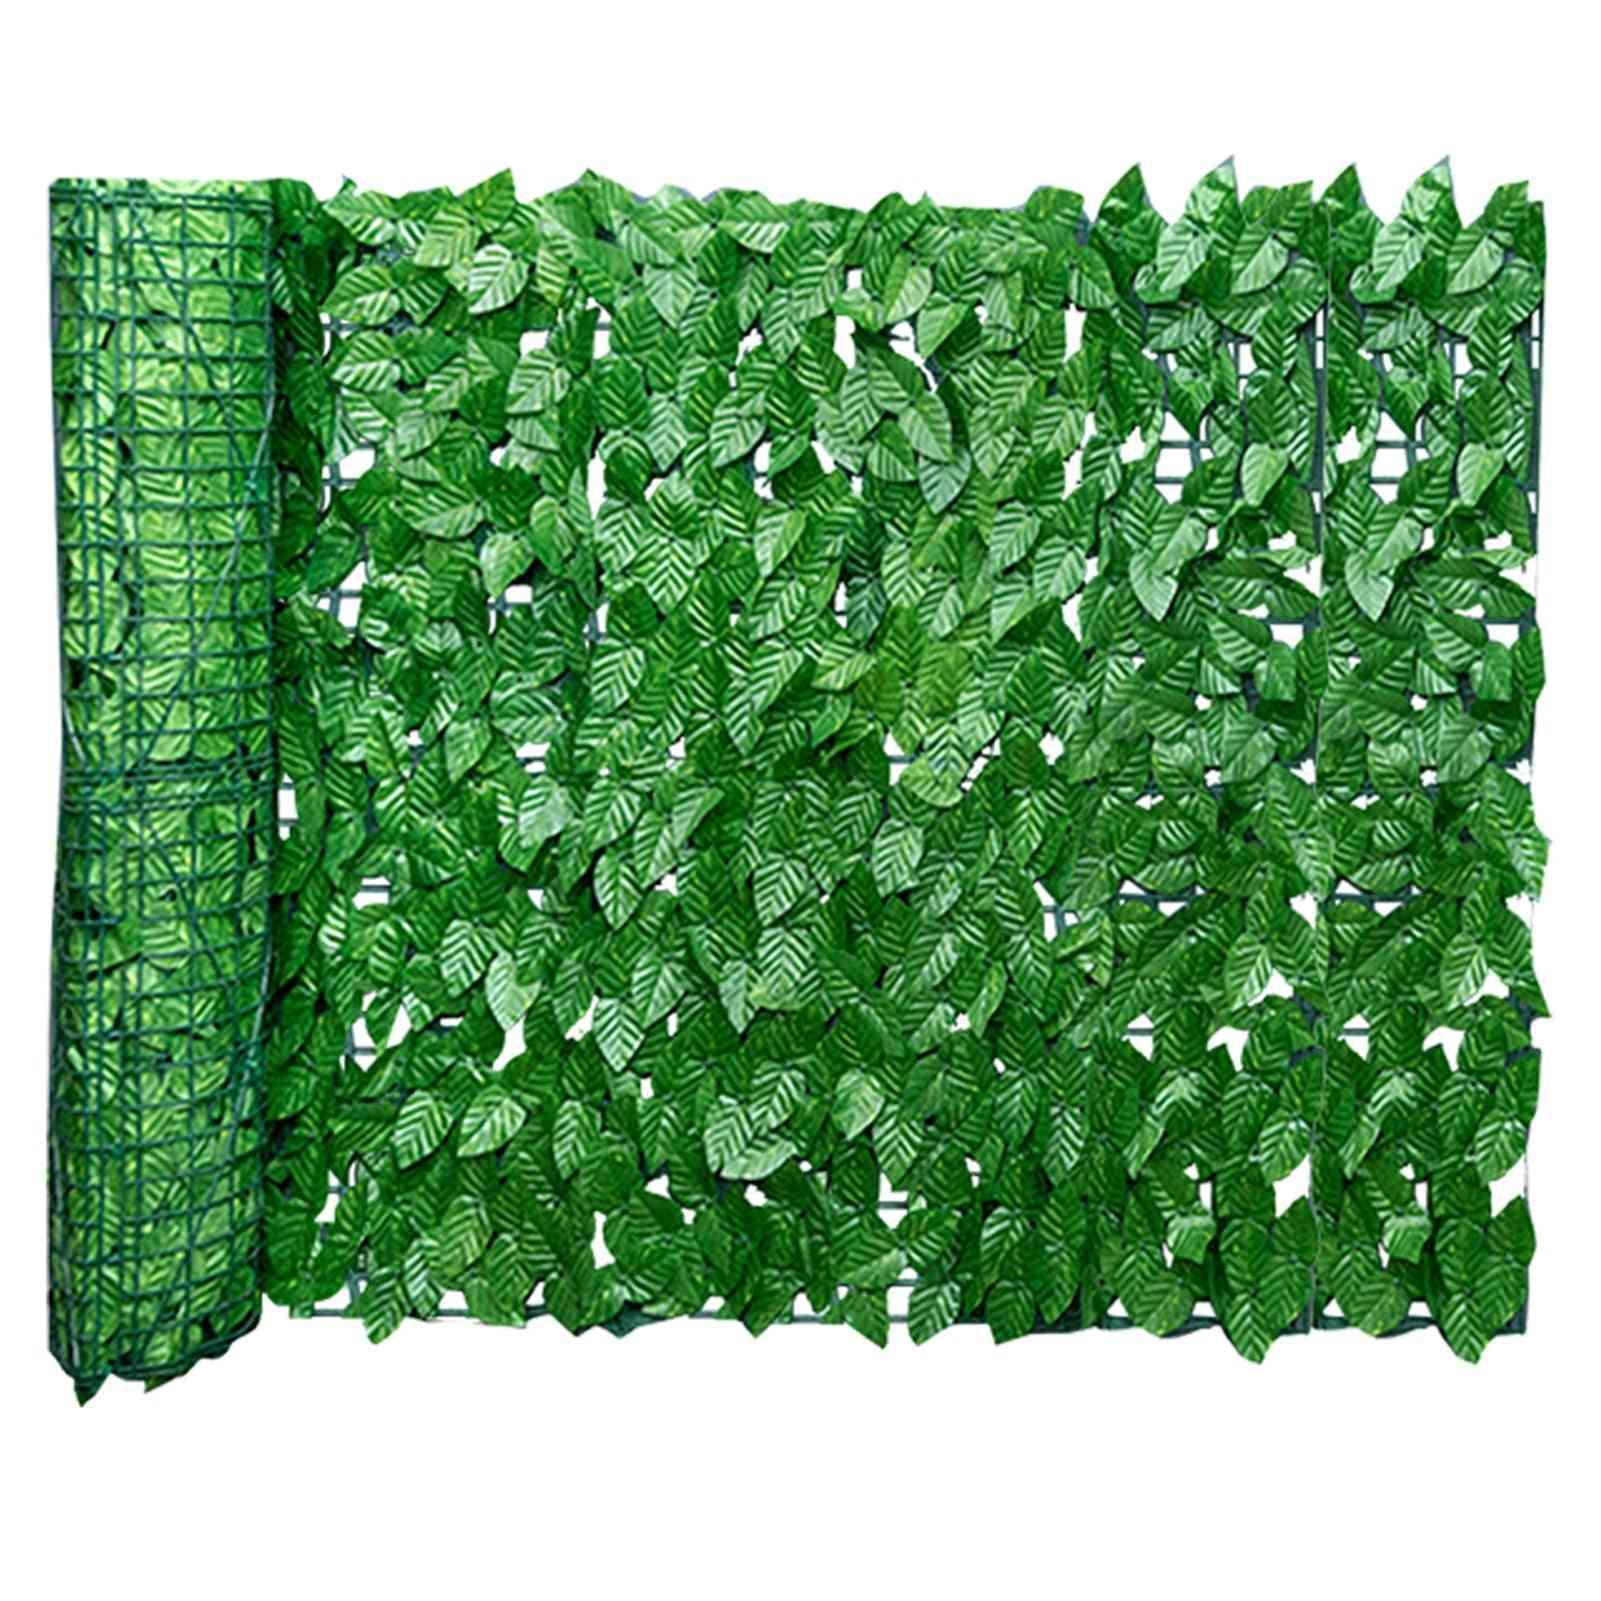 Artificial Leaf Garden Fence